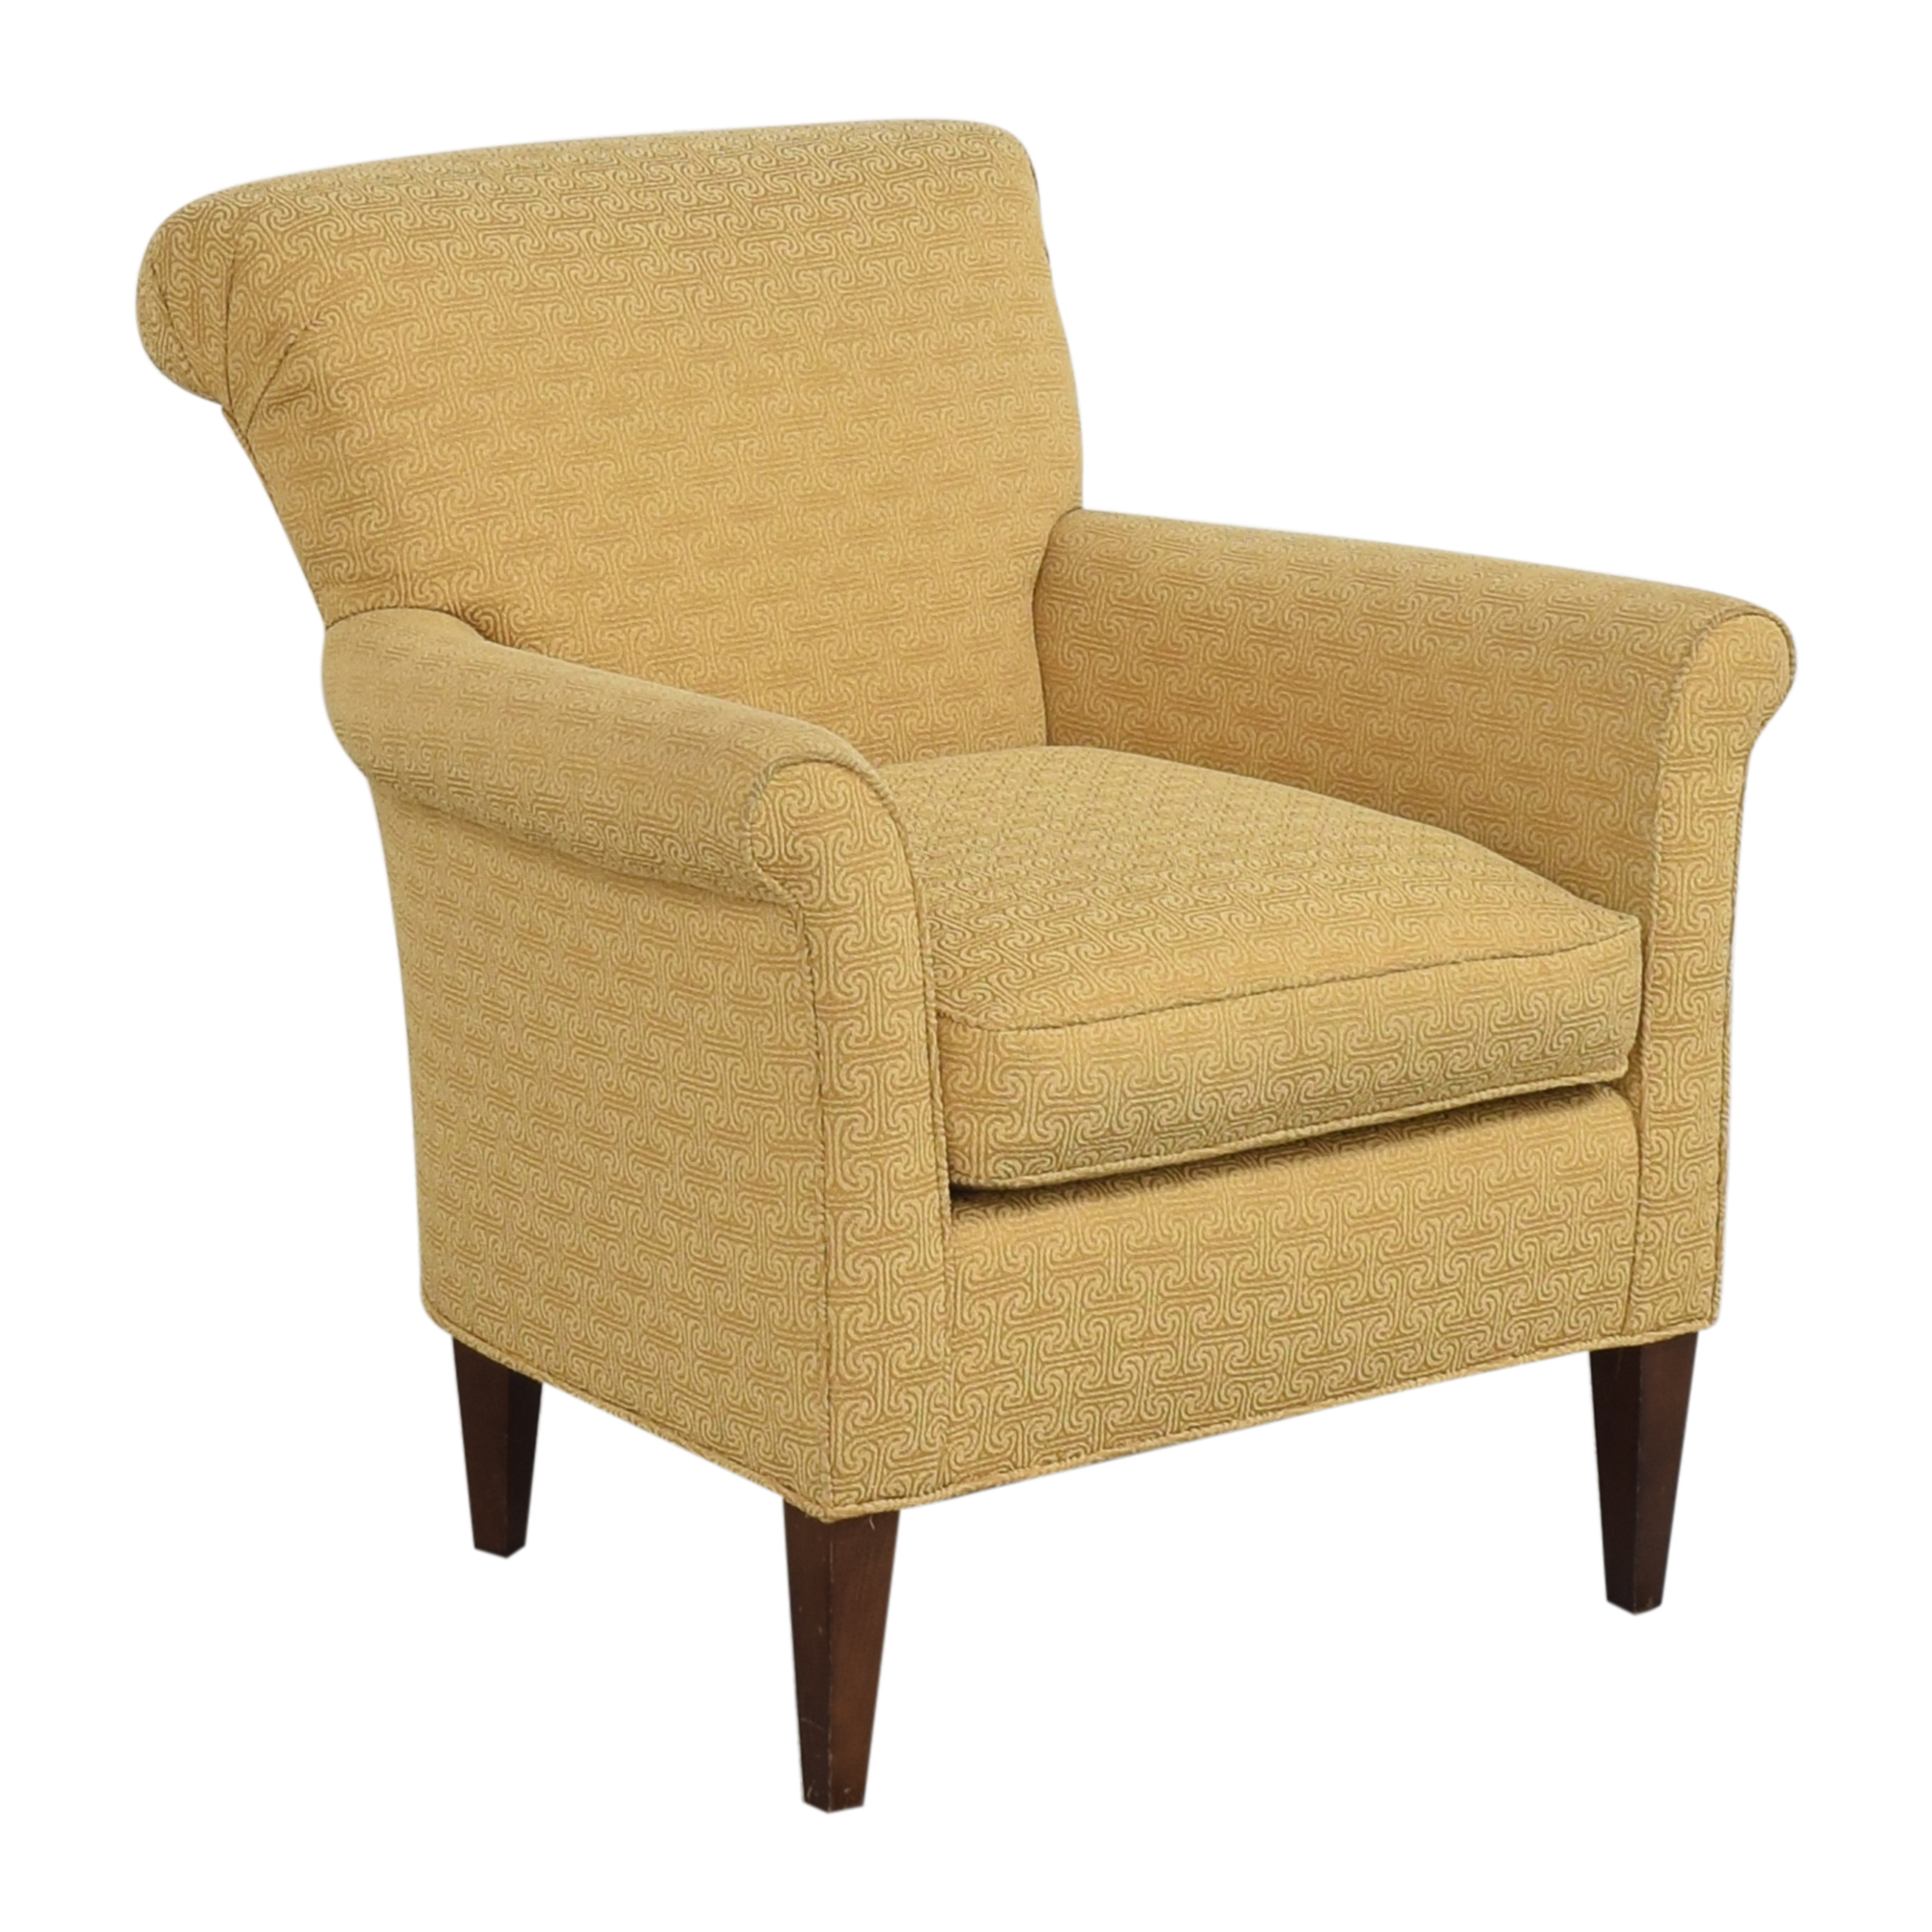 Ethan Allen Ethan Allen Scroll Back Accent Chair on sale